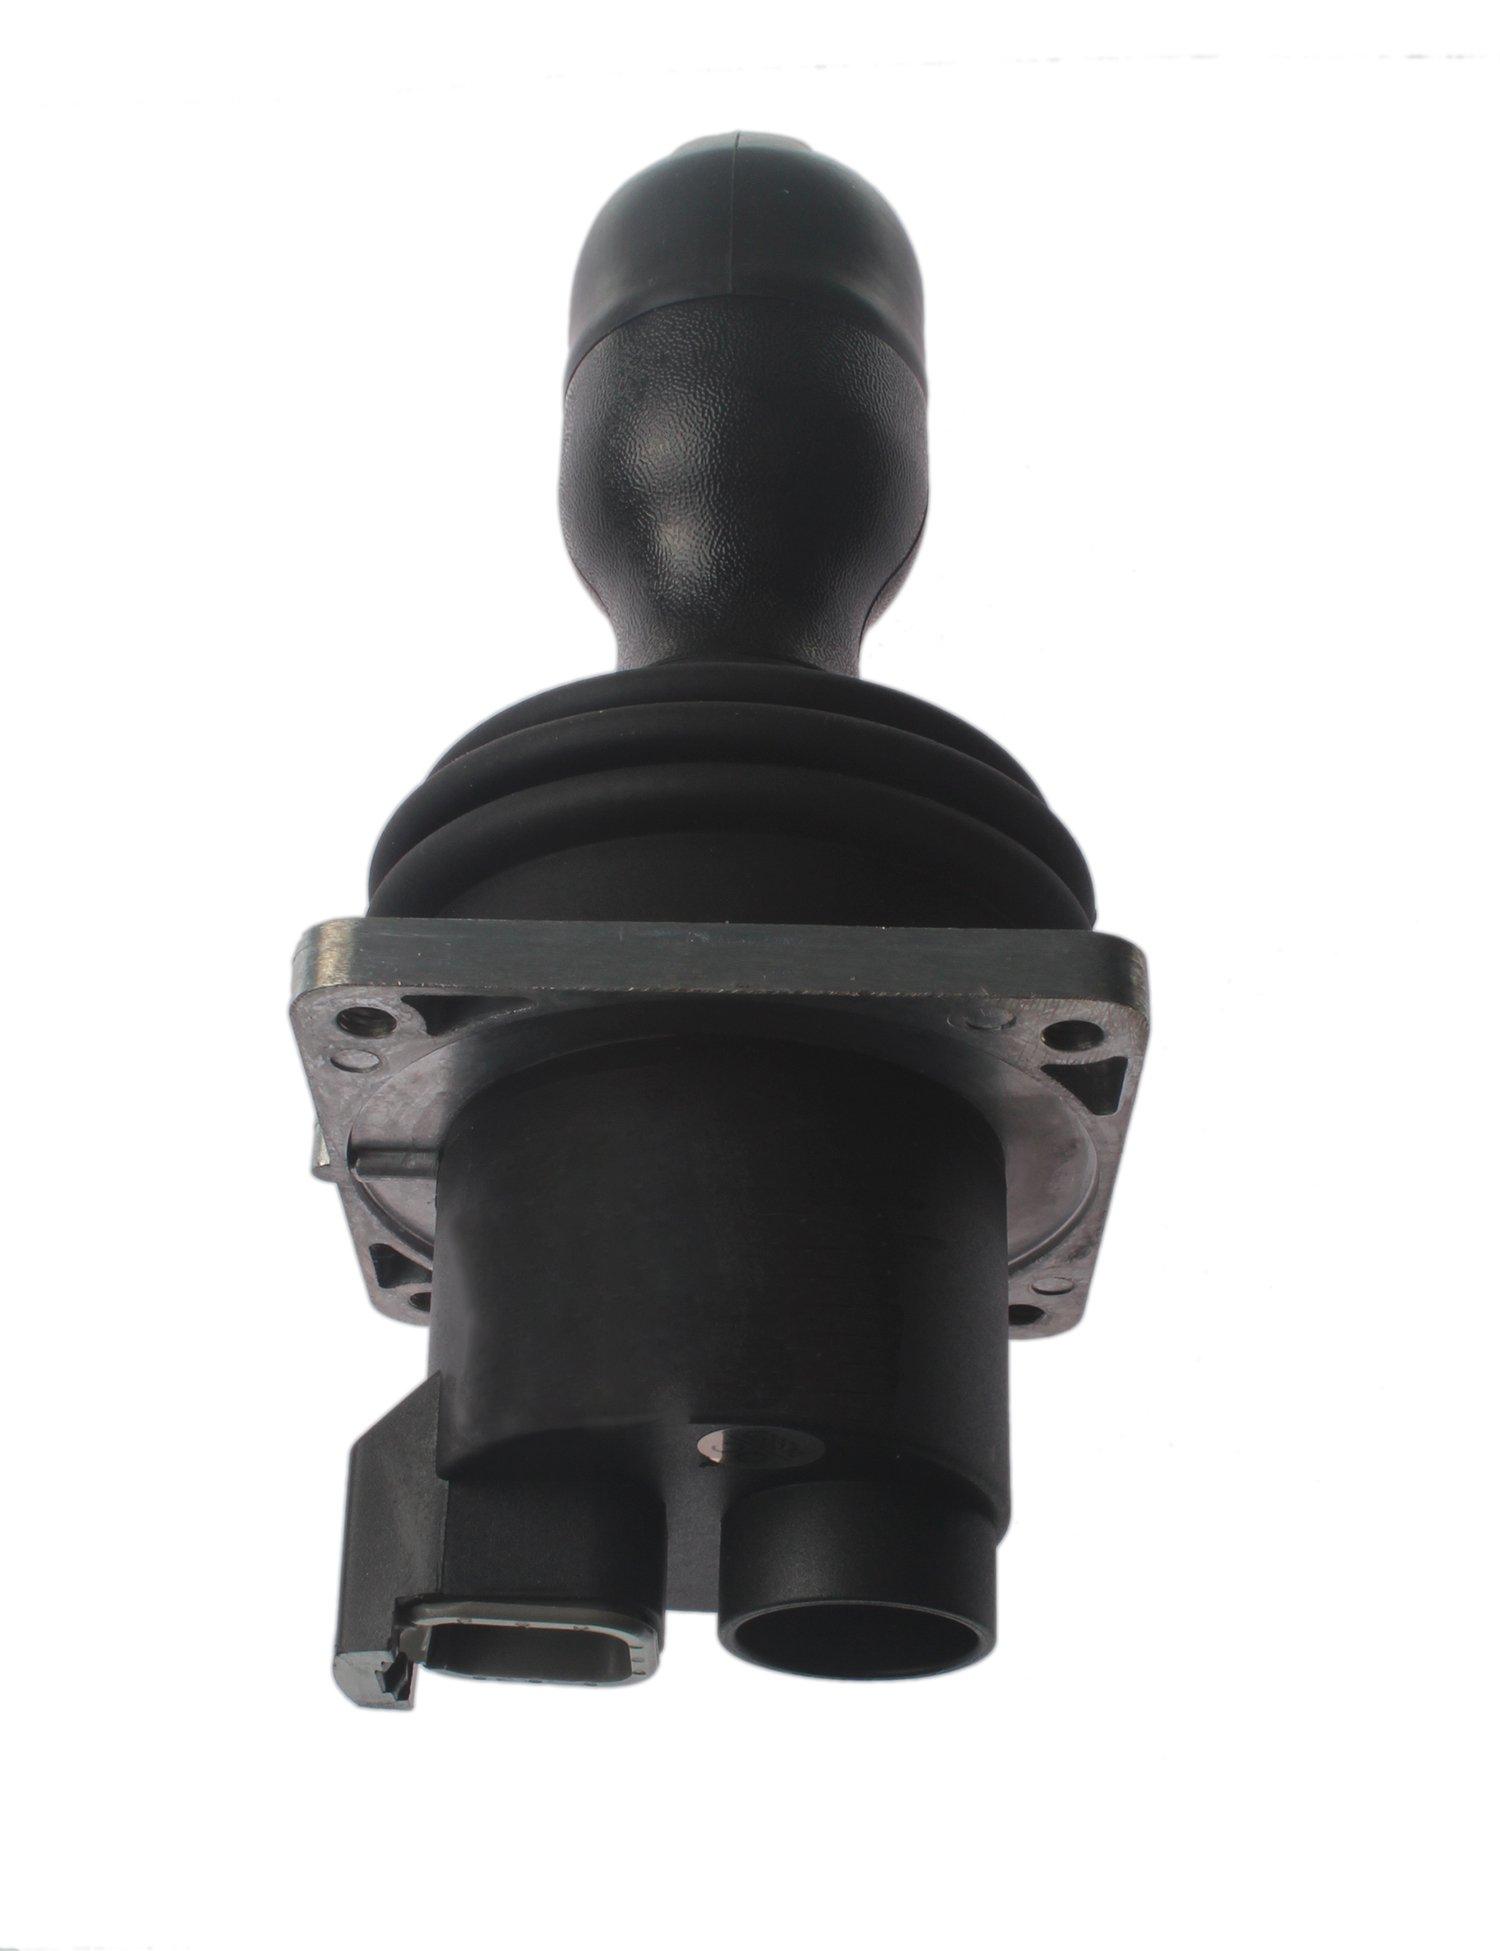 Single Axis Joystick Controller 101005 101005GT for Genie Z Boom Lifts Z-33/18 Z-40/23N Z-45/25 Z-51/30J Z-60/34 Z-62/40 Z-80/60 S-40 S-60 S-65 S-80 S-85 S-100 S-120 S-3200